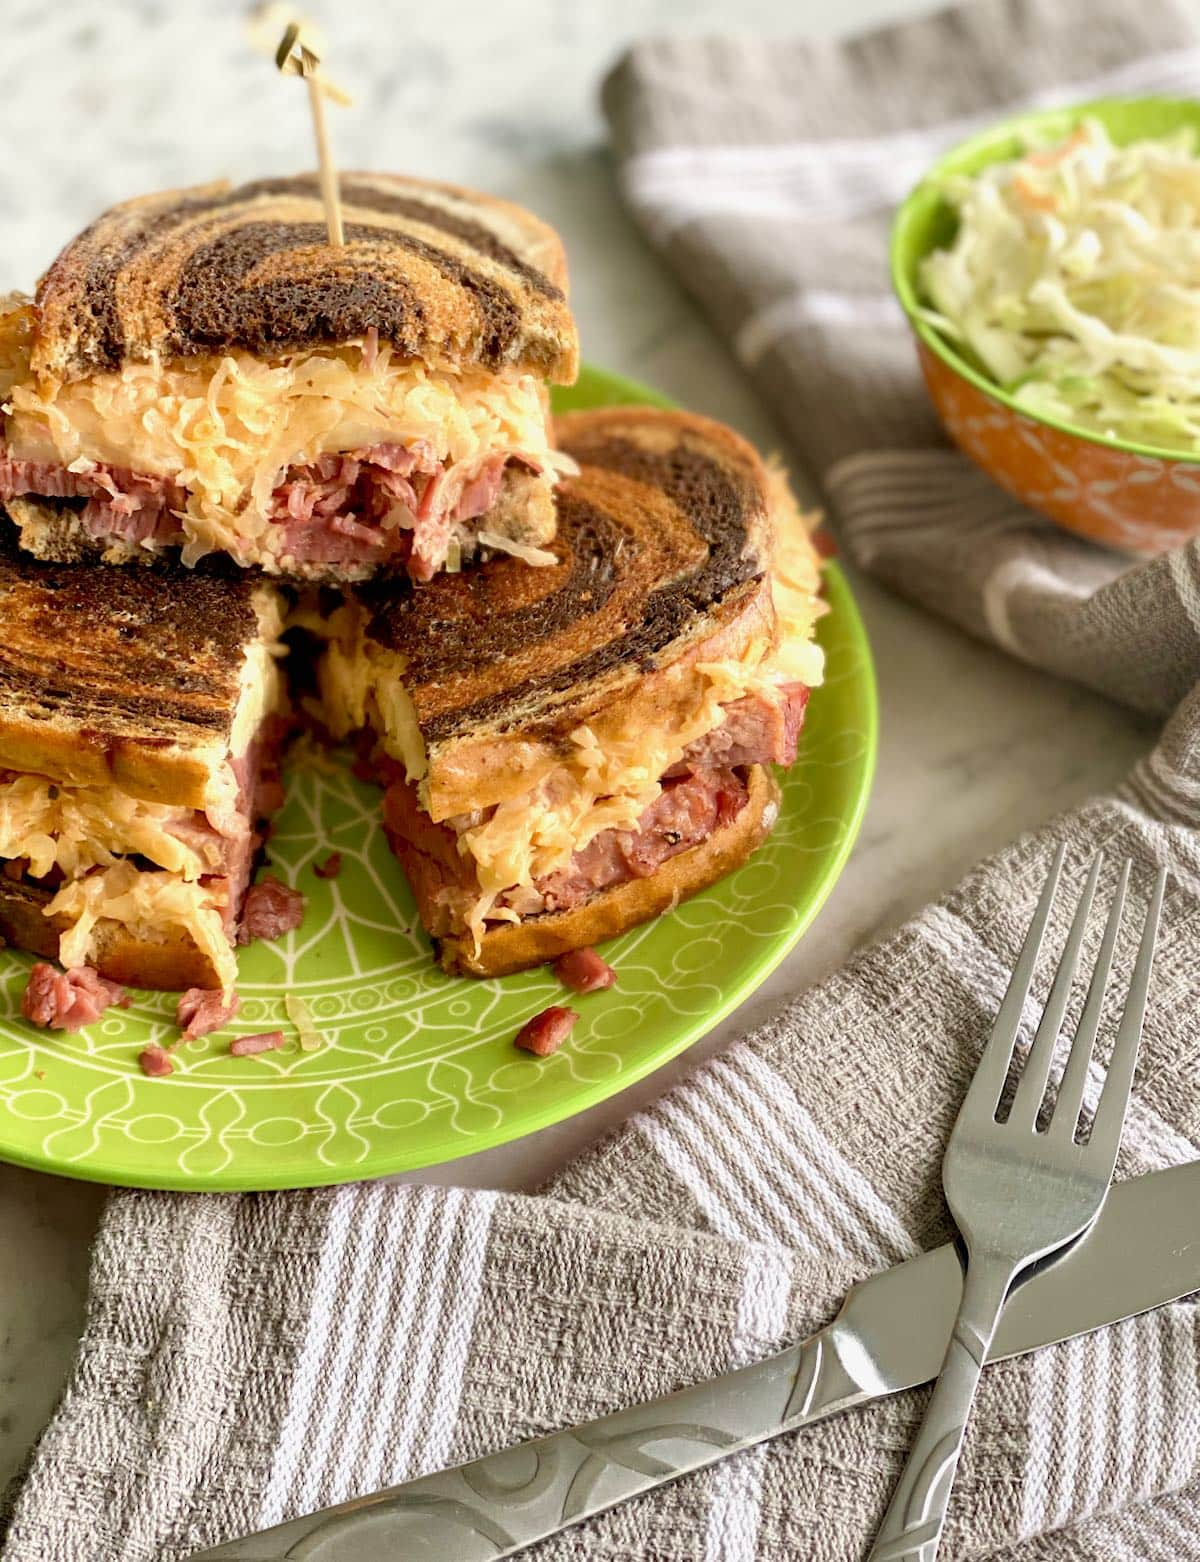 corned beef reuben sandwich with a side of slaw.